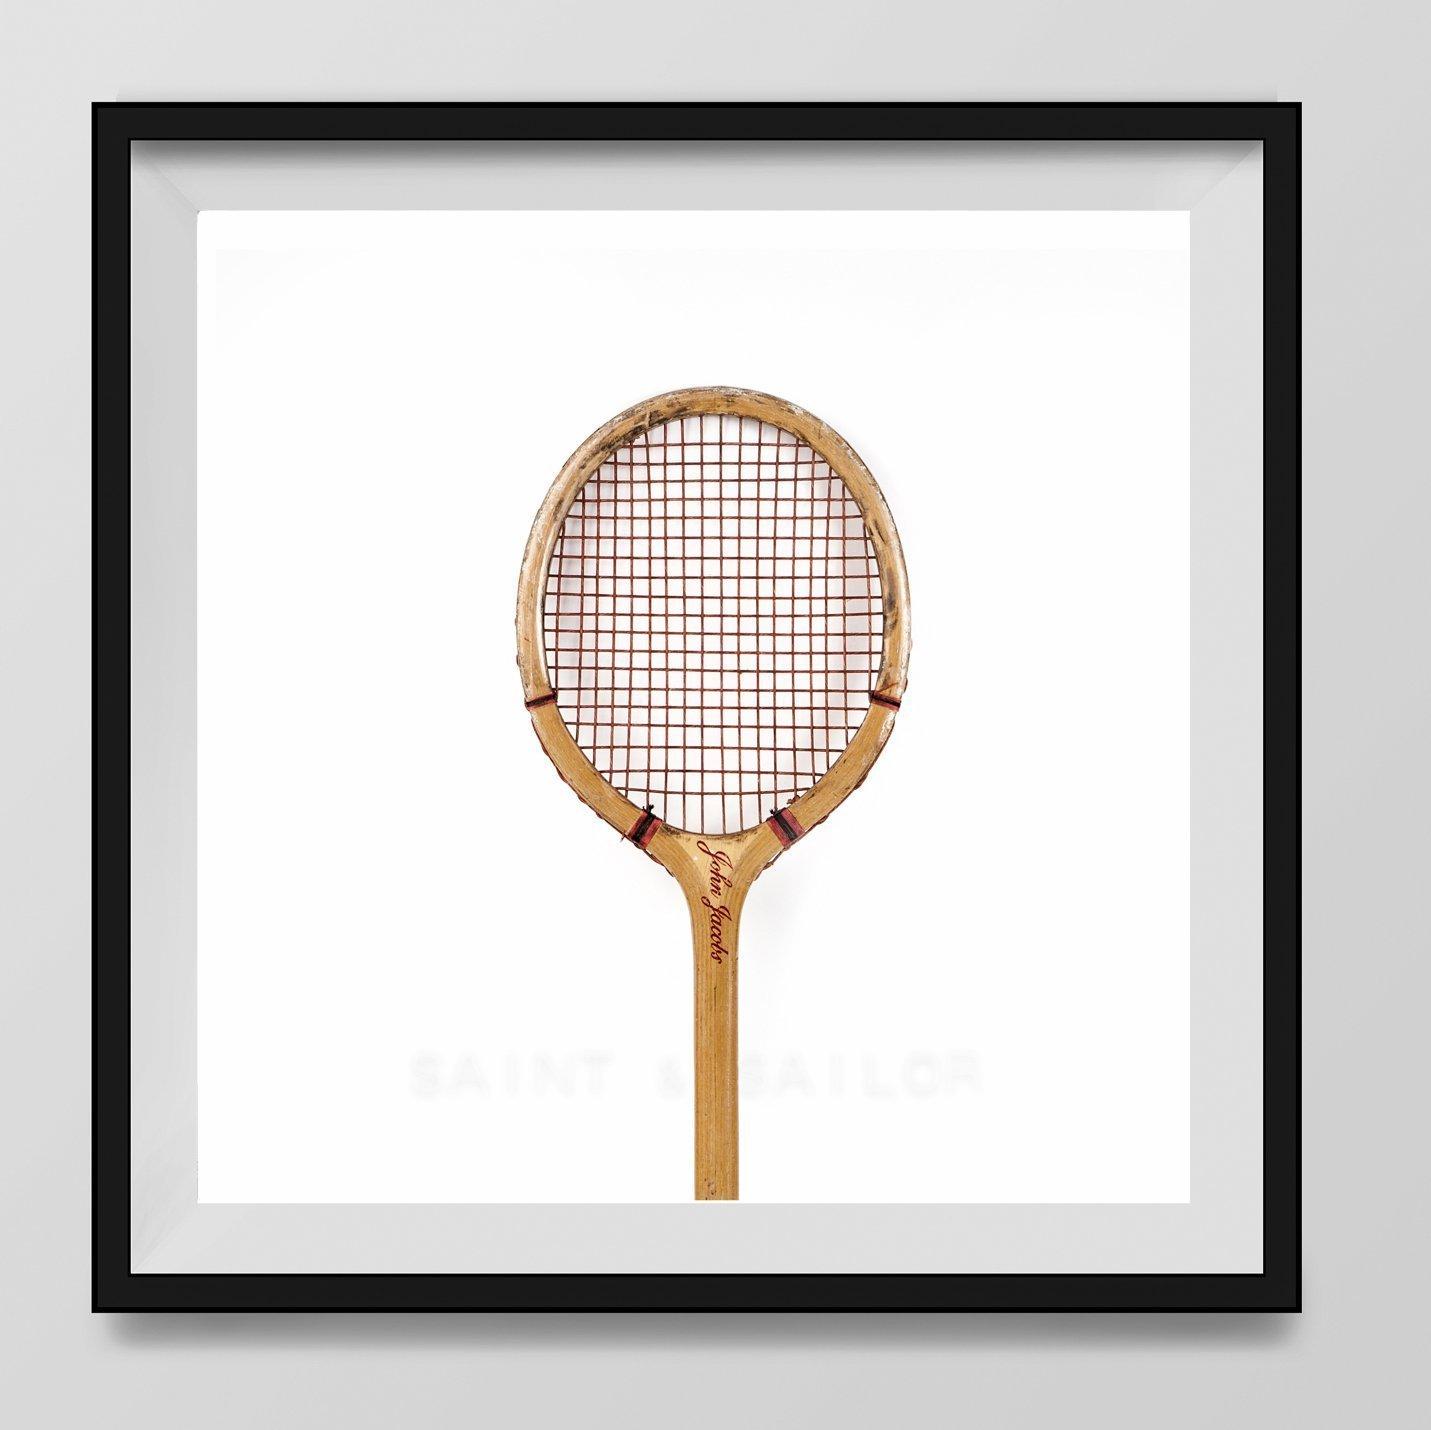 Vintage Tennis Racket on White Background Fine Art Photography Print, Vintage Sports Nursery Art, Sports Decor, Man Cave art, Sport Prints, Boys Nursery decor, Kids Room Wall Art,